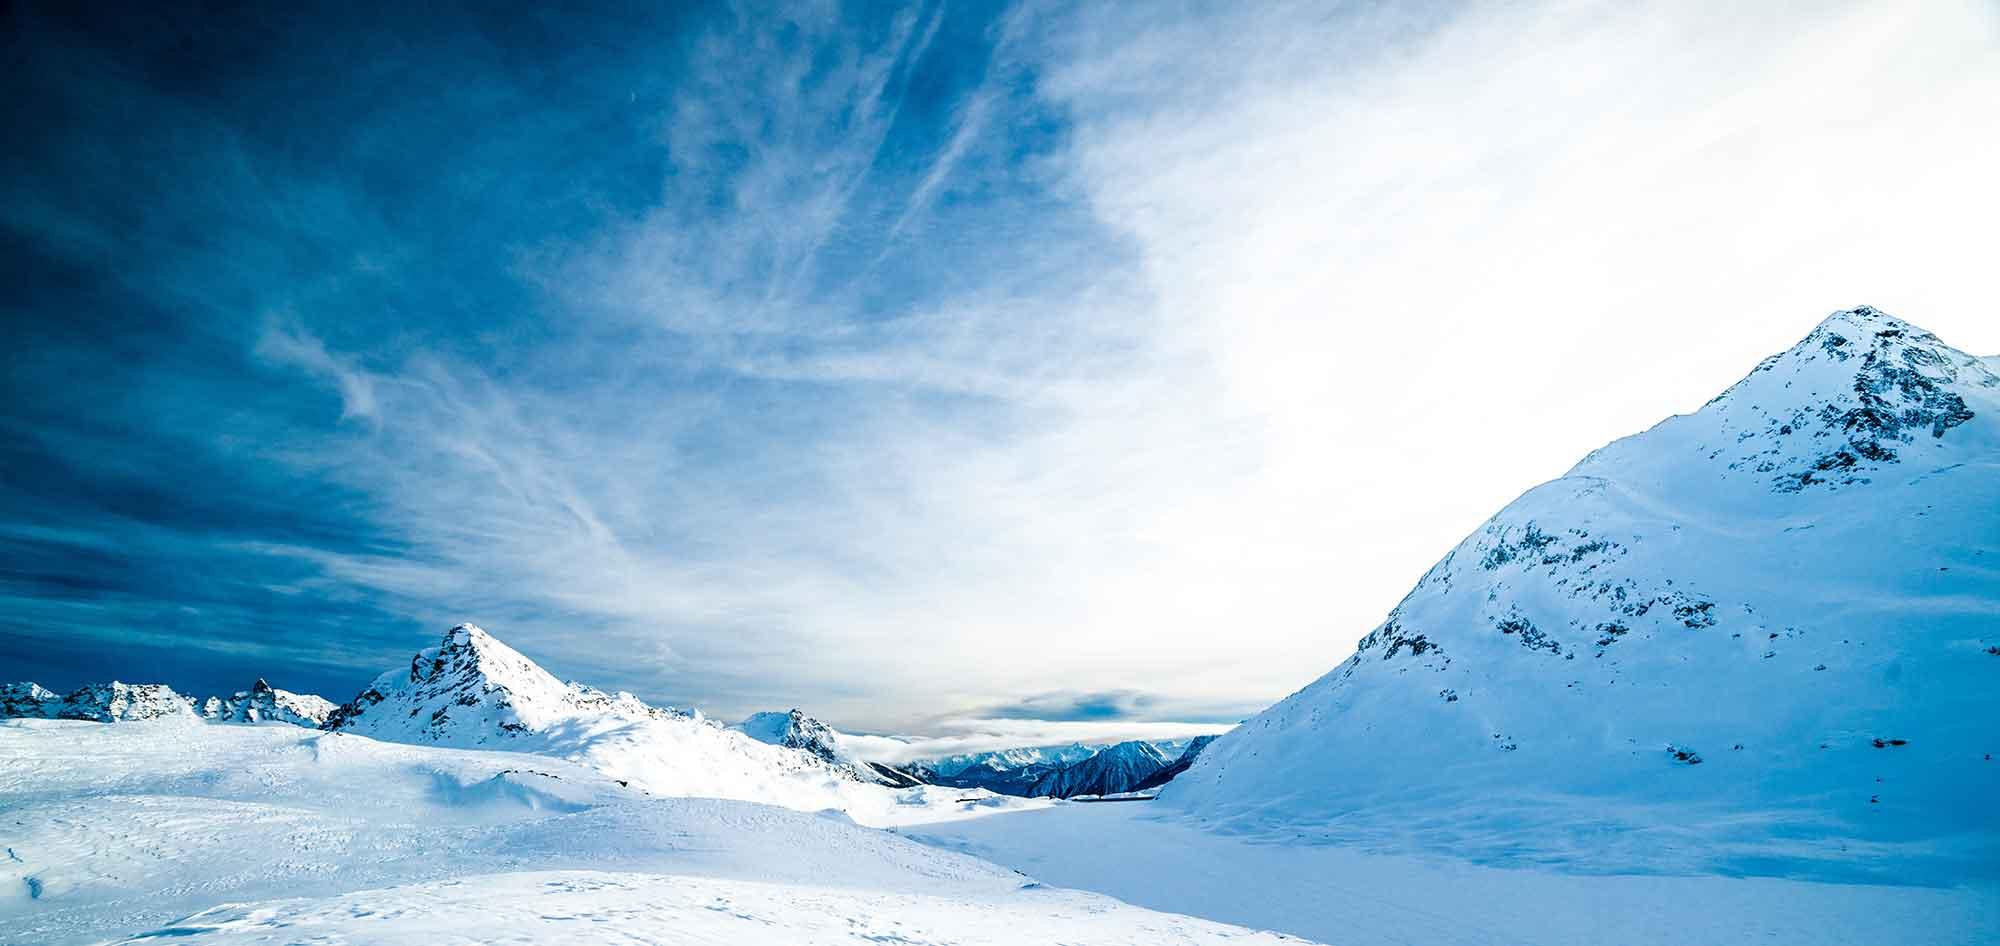 Mountains colder than cryo